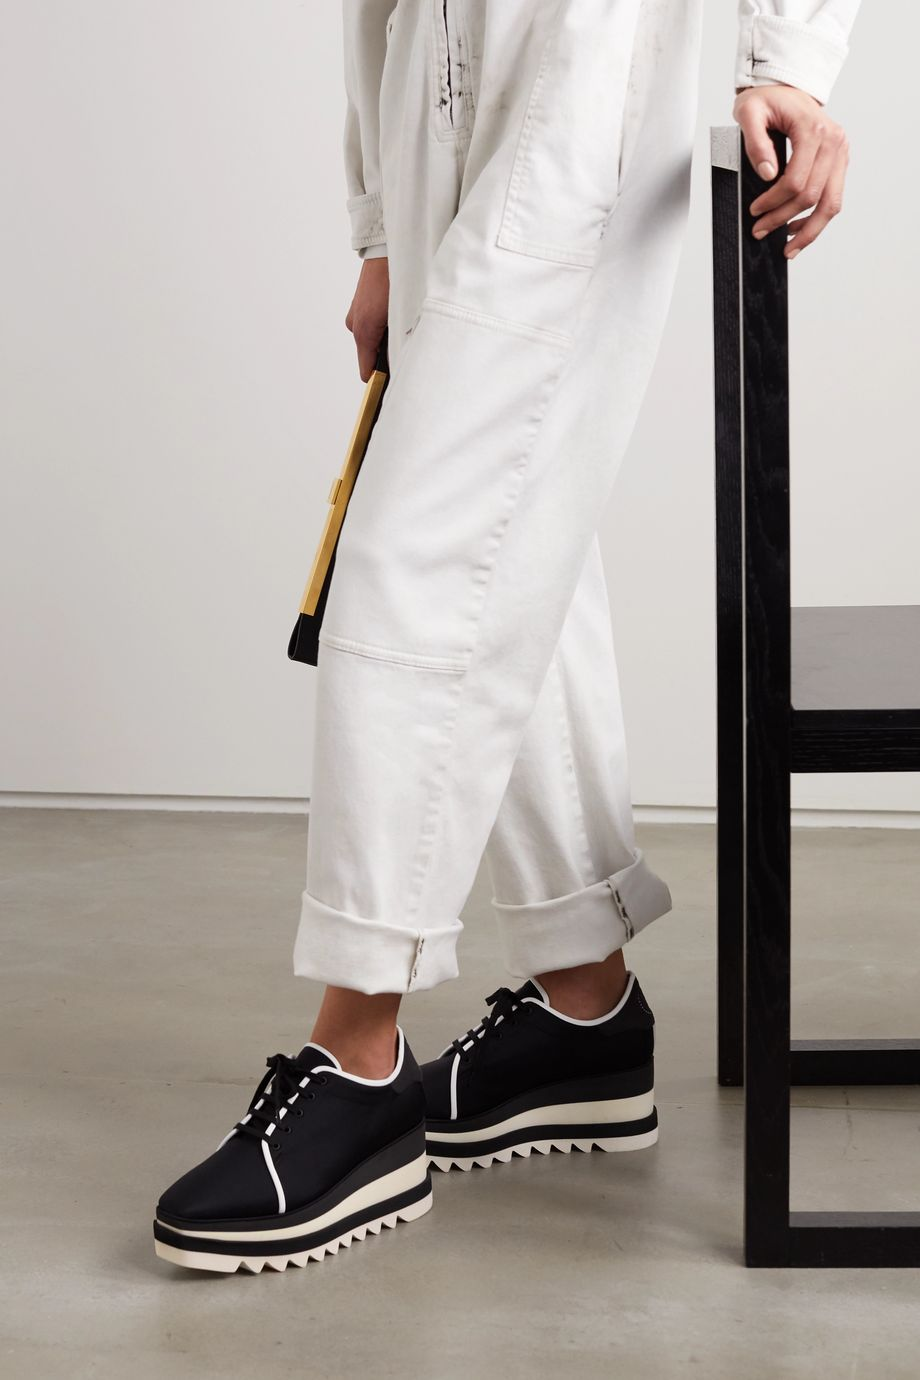 Stella McCartney Elyse faux suede-trimmed neoprene platform brogues